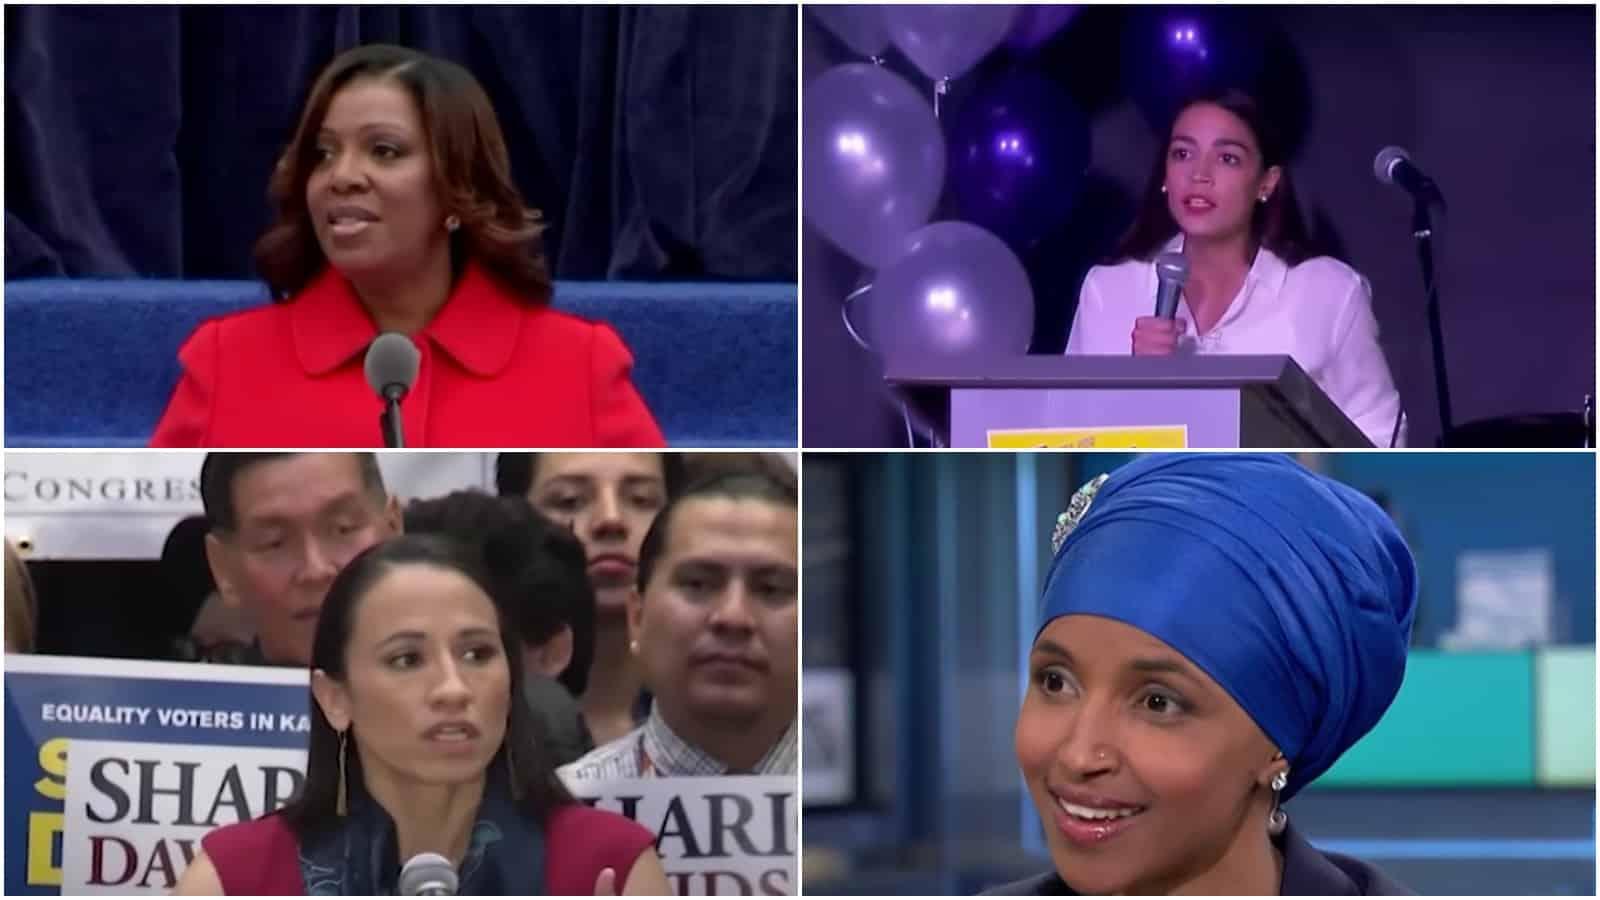 Letitia Tish James, alexandria ocasio-cortez, Ilhan Omar, Sharice Davids, midterm elections, women